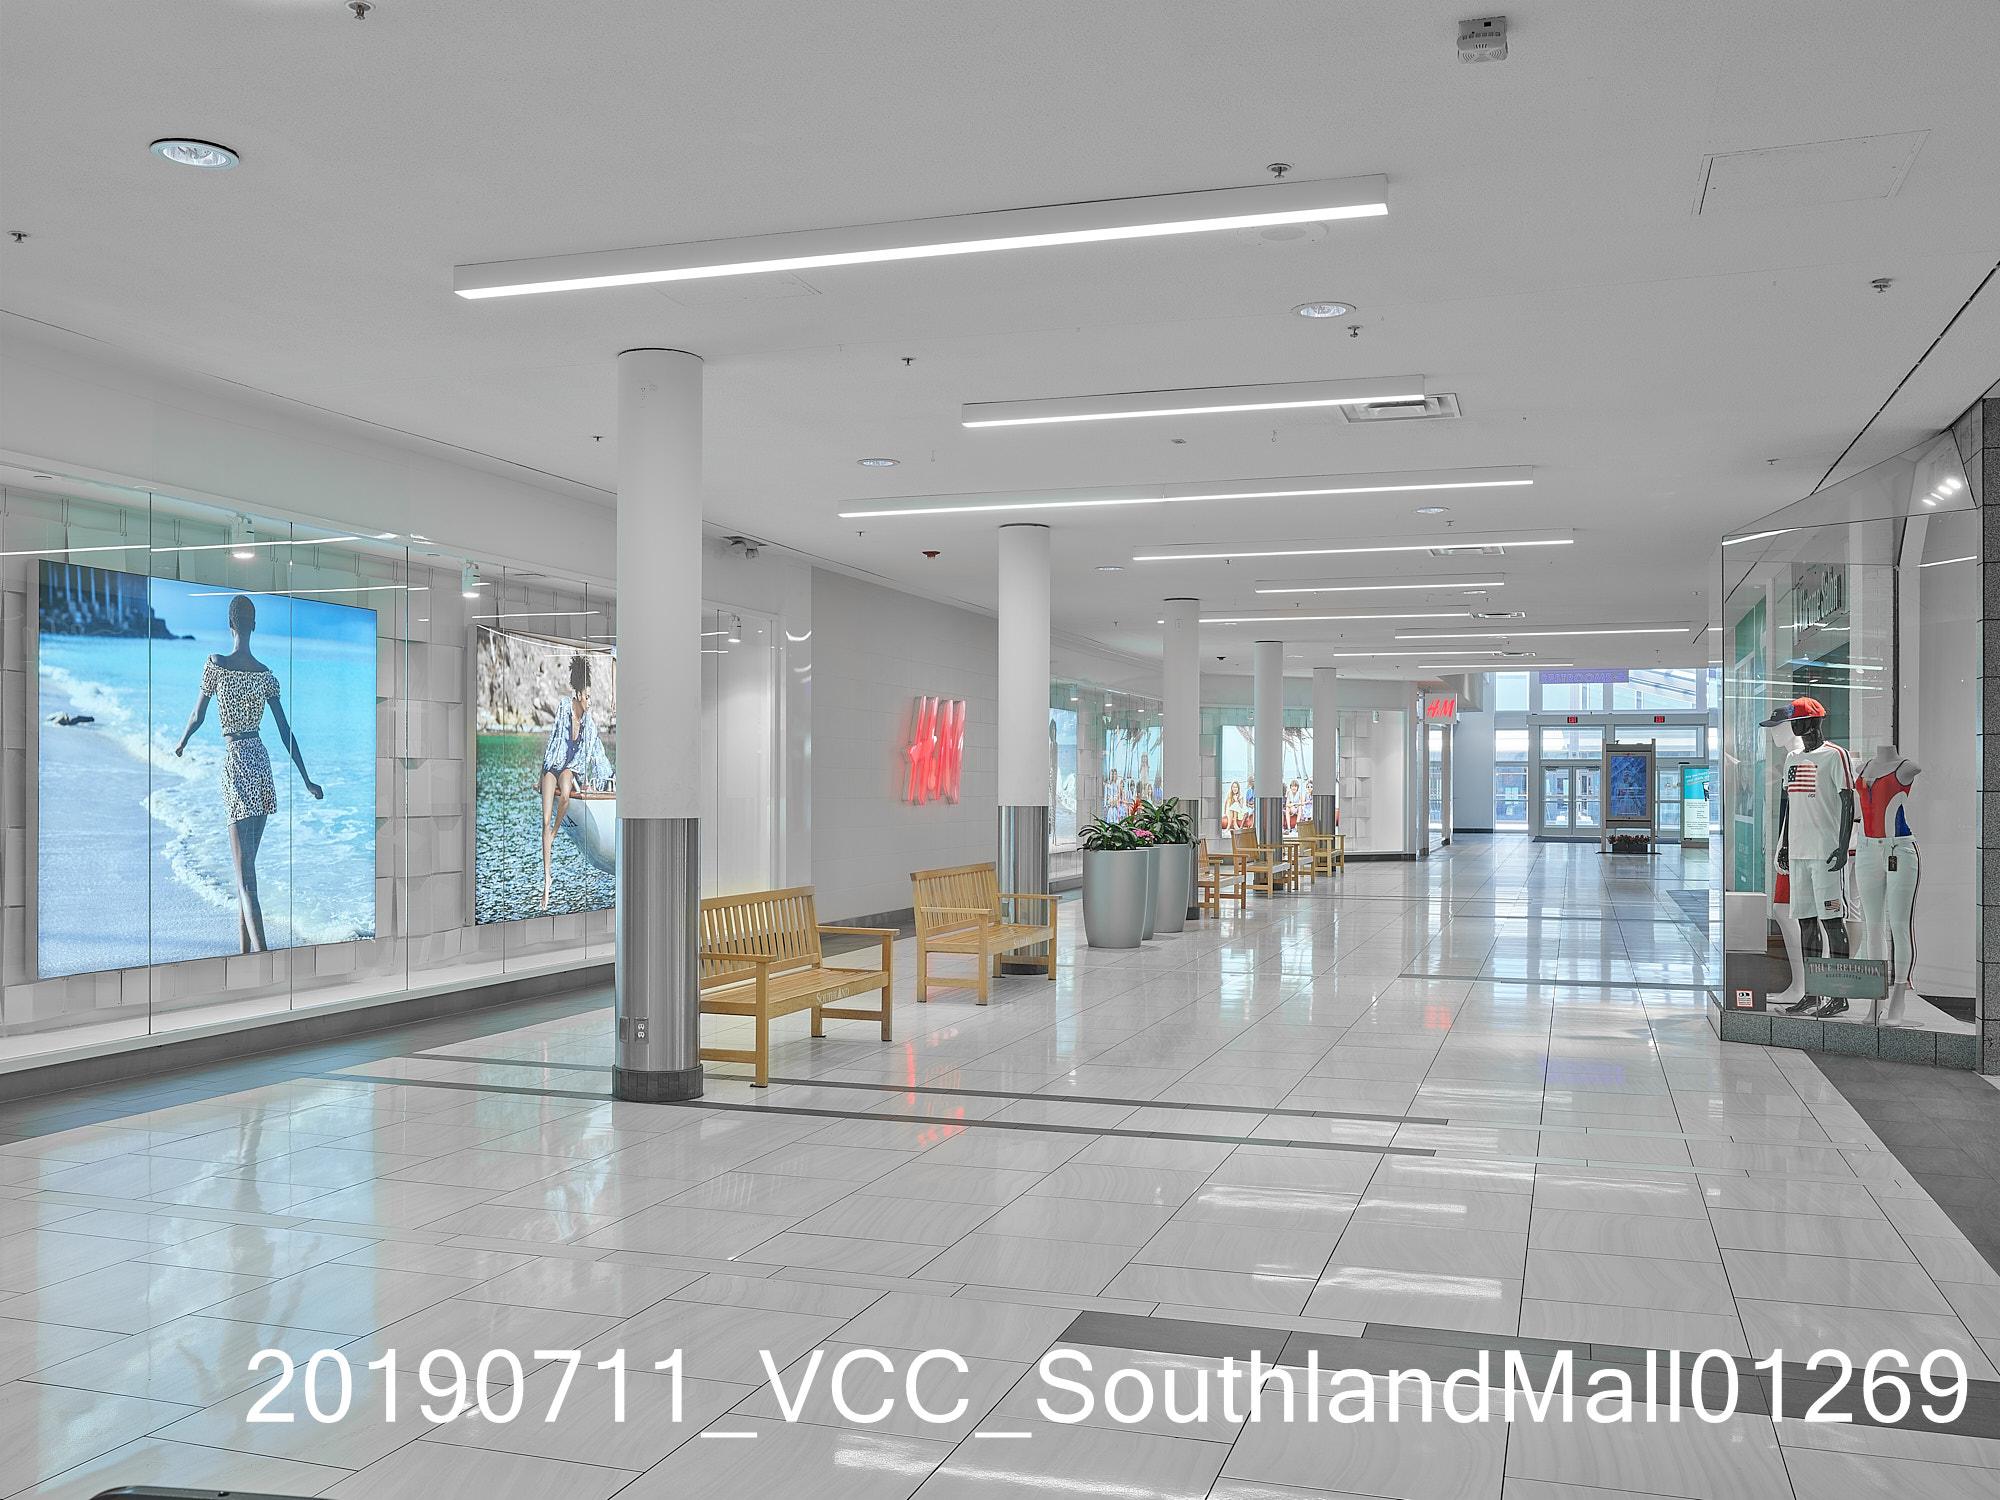 20190711_VCC_SouthlandMall01269.jpg